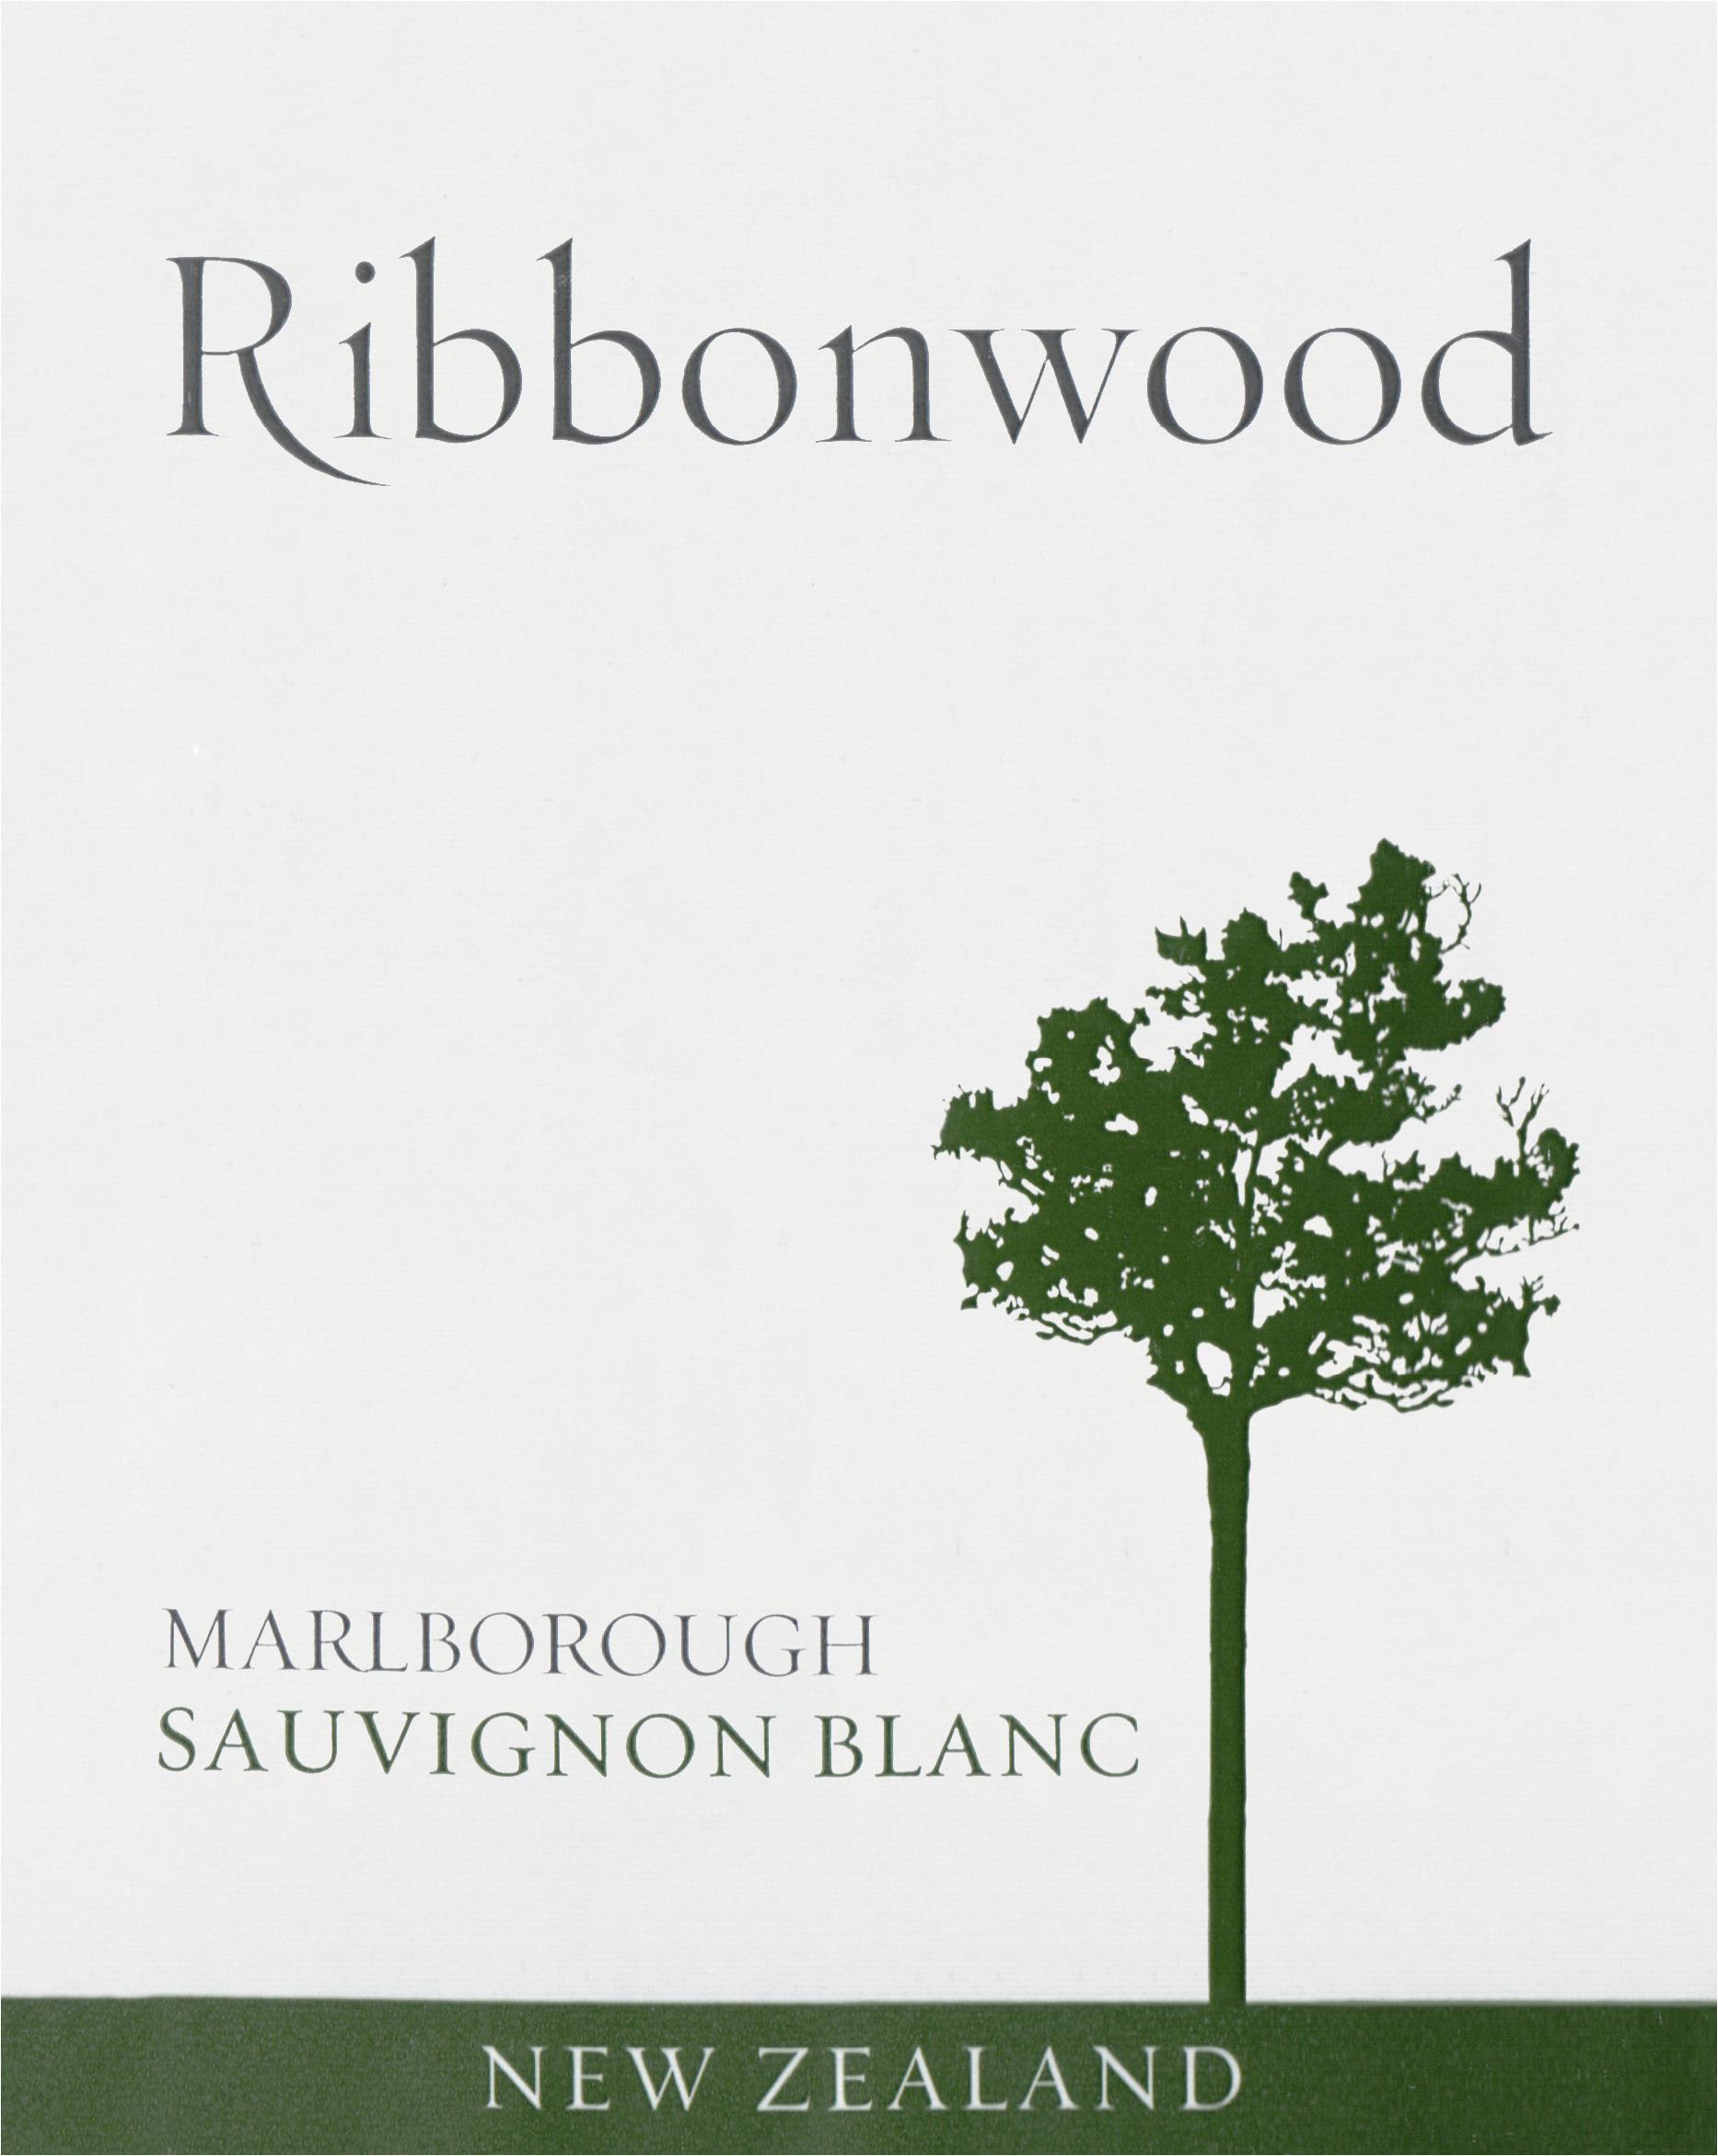 Ribbonwood Sauvignon Blanc 2019